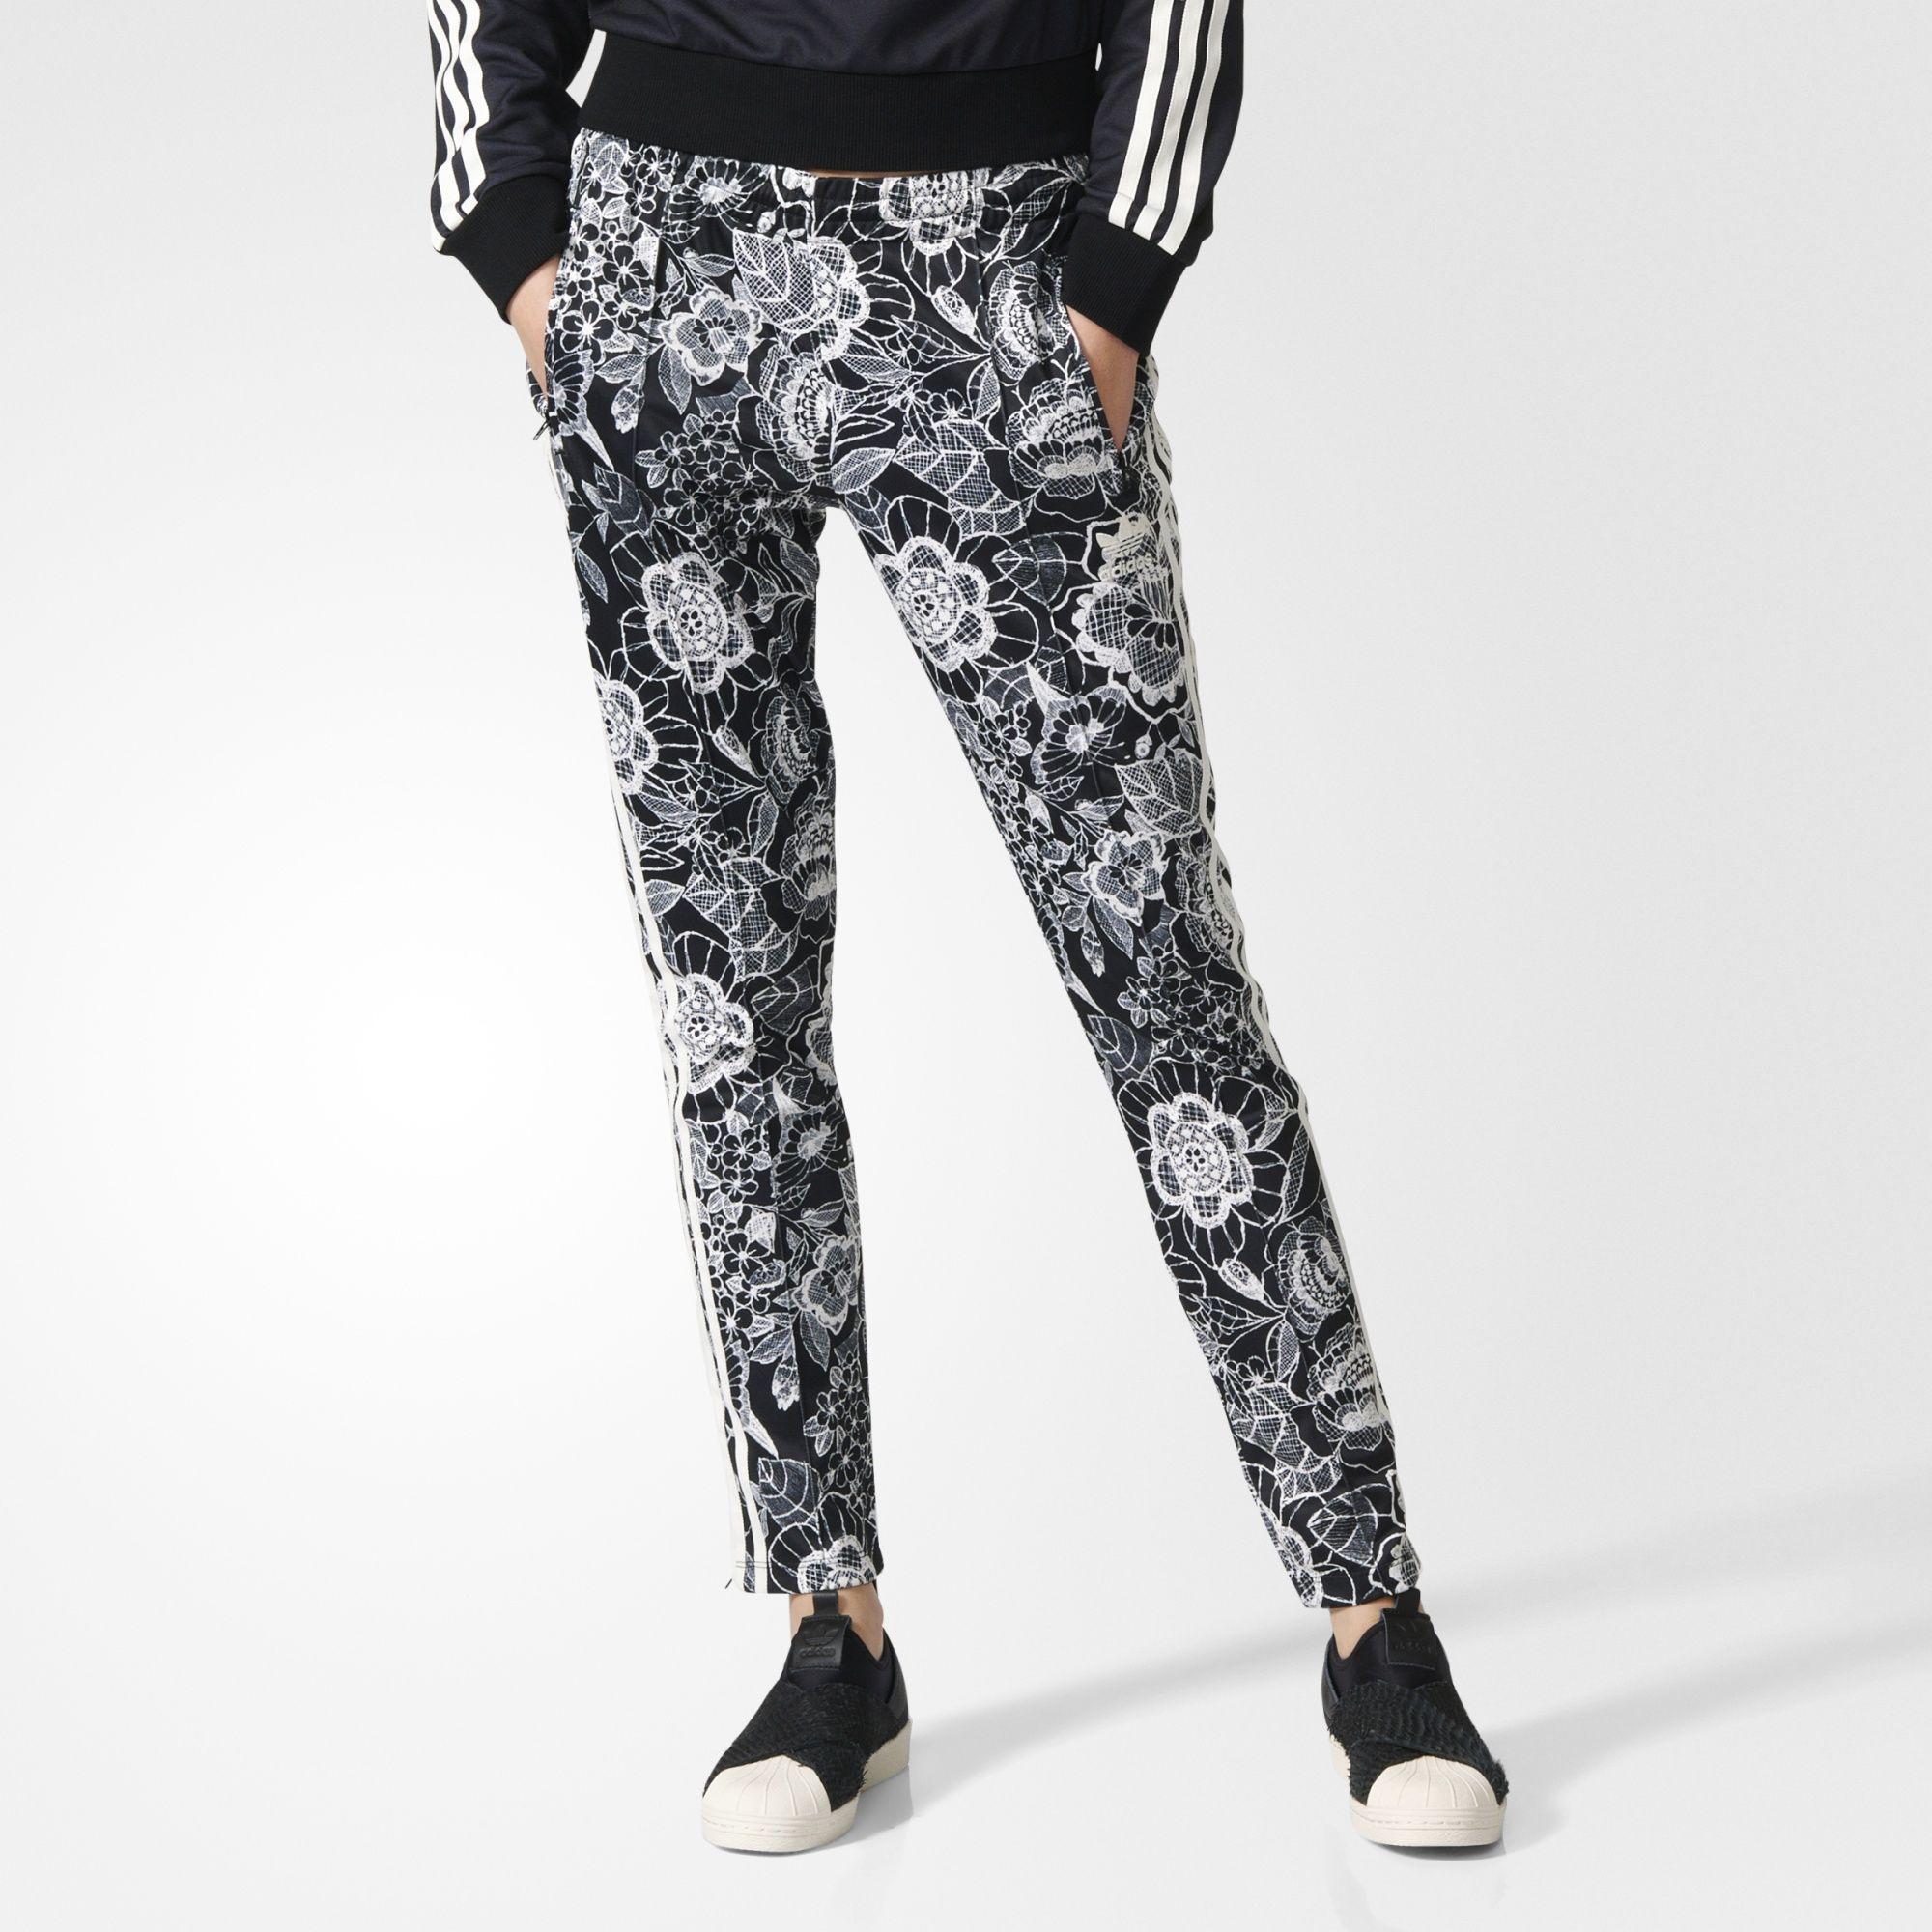 Lima T preferir  adidas - Pantalón SST Florido   Pantalones adidas, Pantalones ...